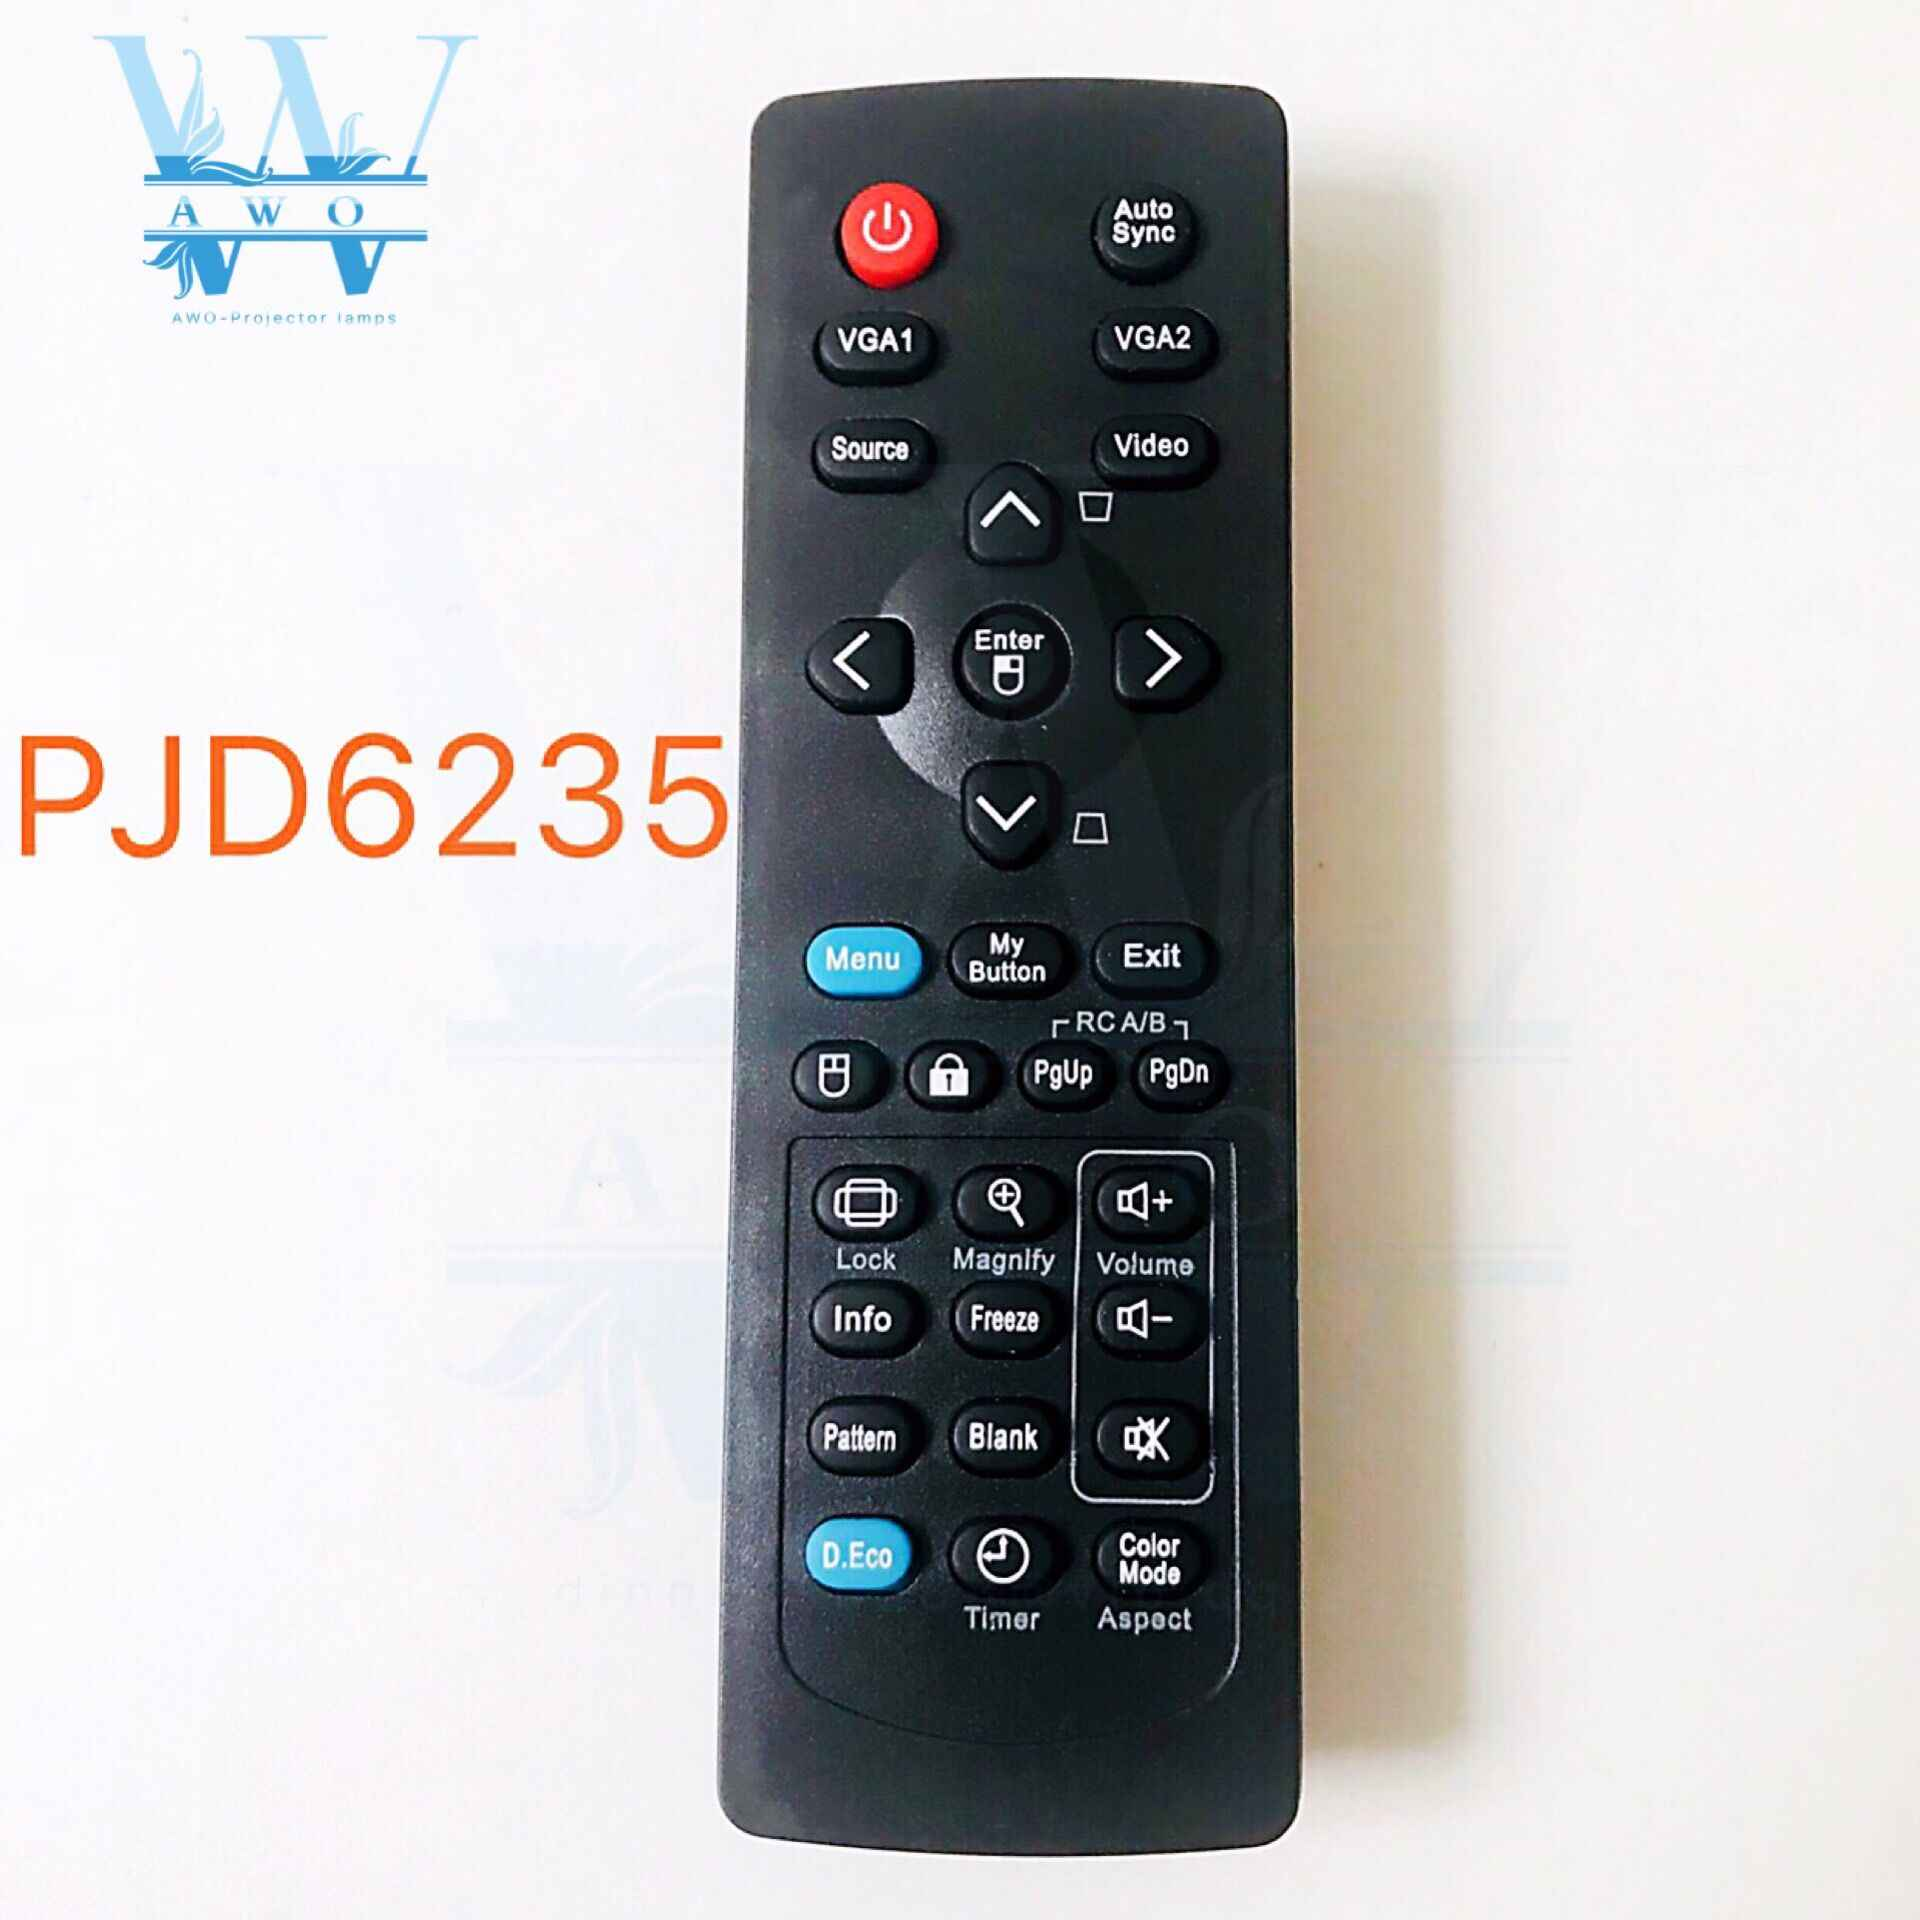 NIEUWE PJD6235 Afstandsbediening Voor ViewSonic Projector PJD6245 PJD6543W PJD5132 PJD5134 PJD5232L PJD5234L PJD5533W PJD6253 PJD6683W